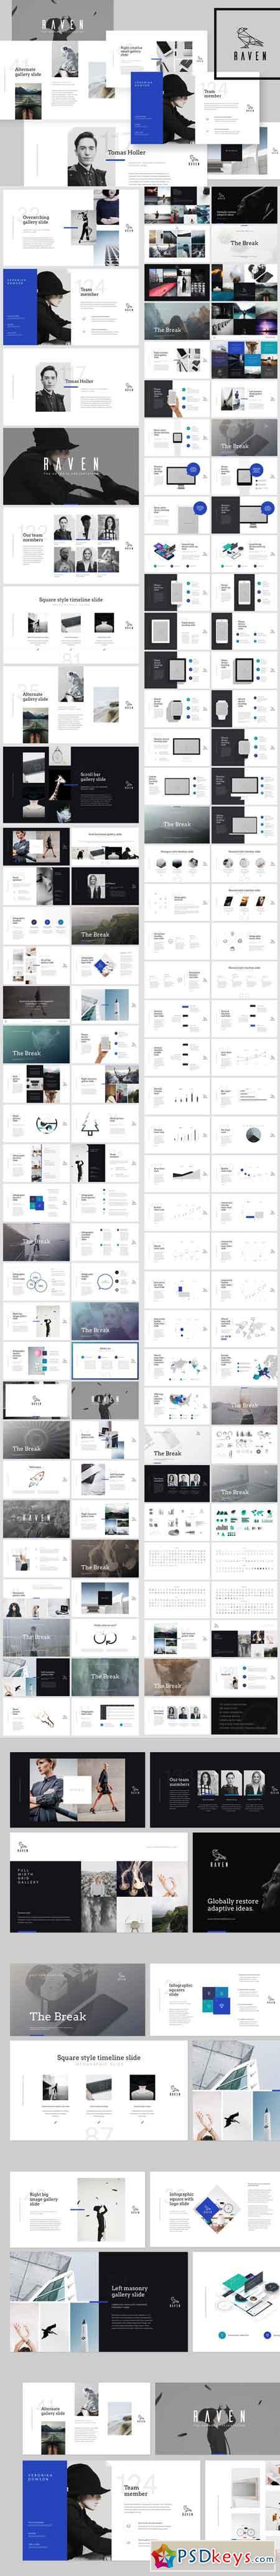 raven keynote presentation + bonus 640967 » free download, Powerpoint templates